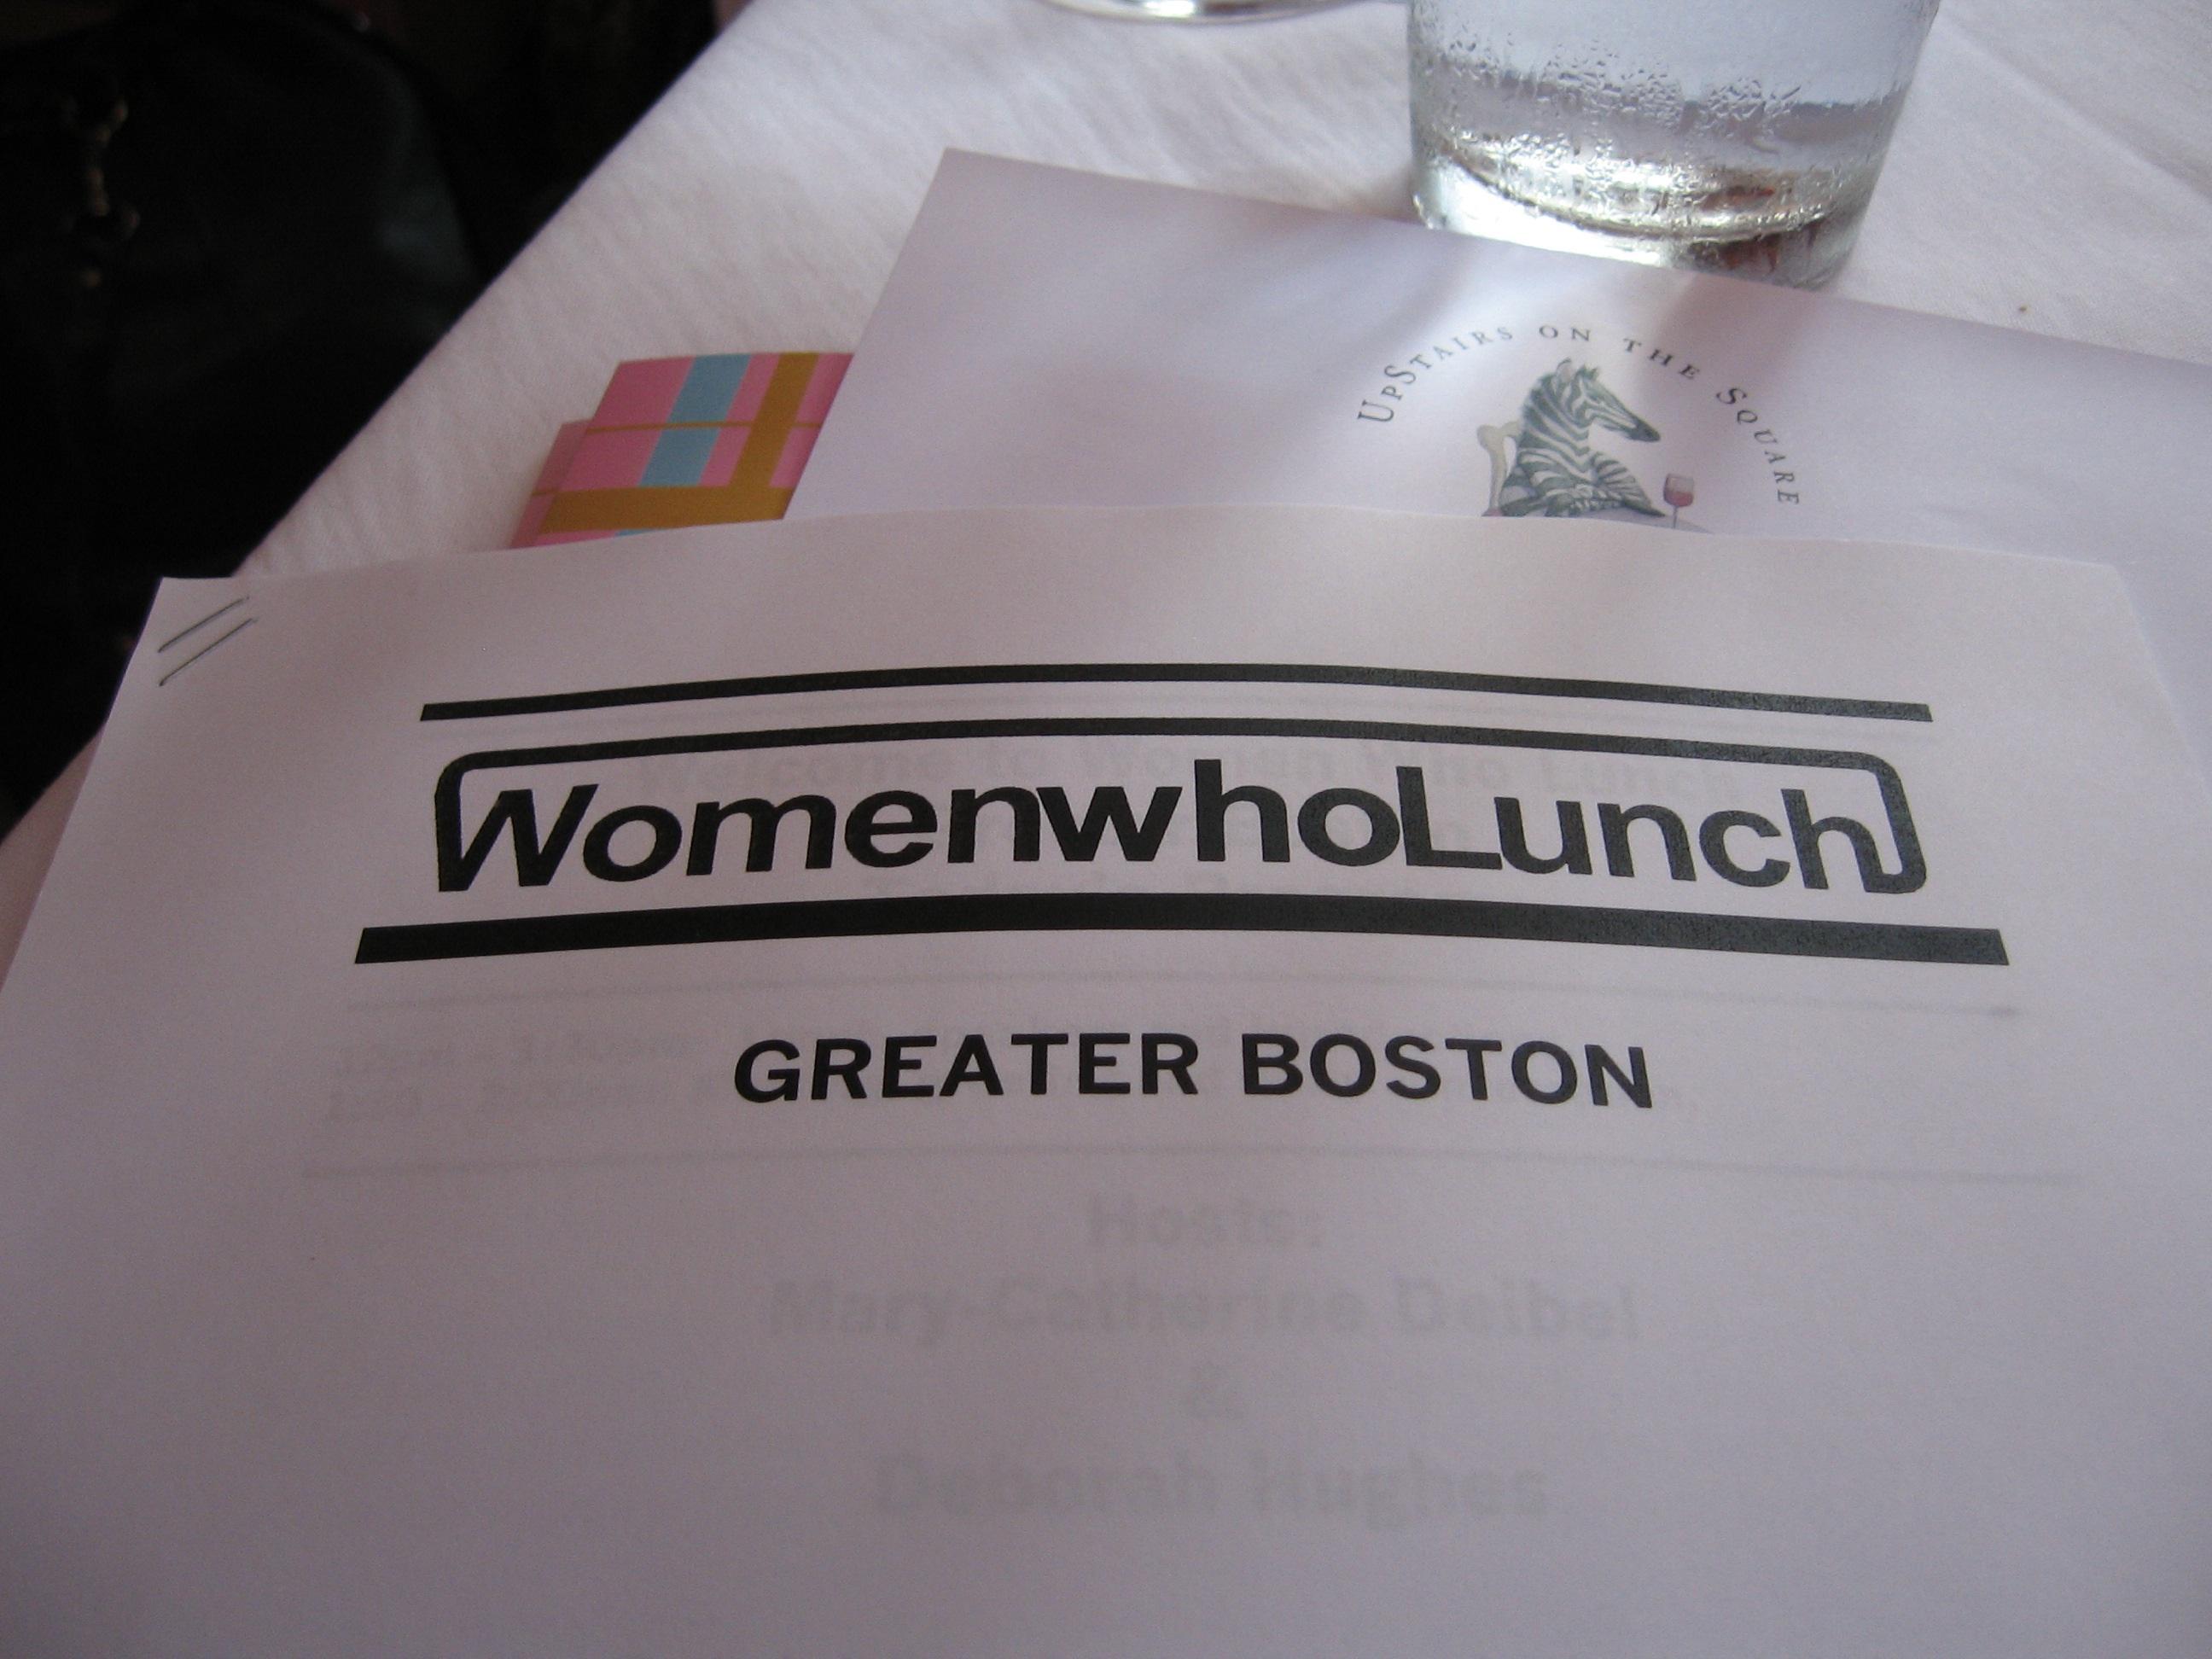 11-2011-Program-of-Bios-from-Lunch.jpg